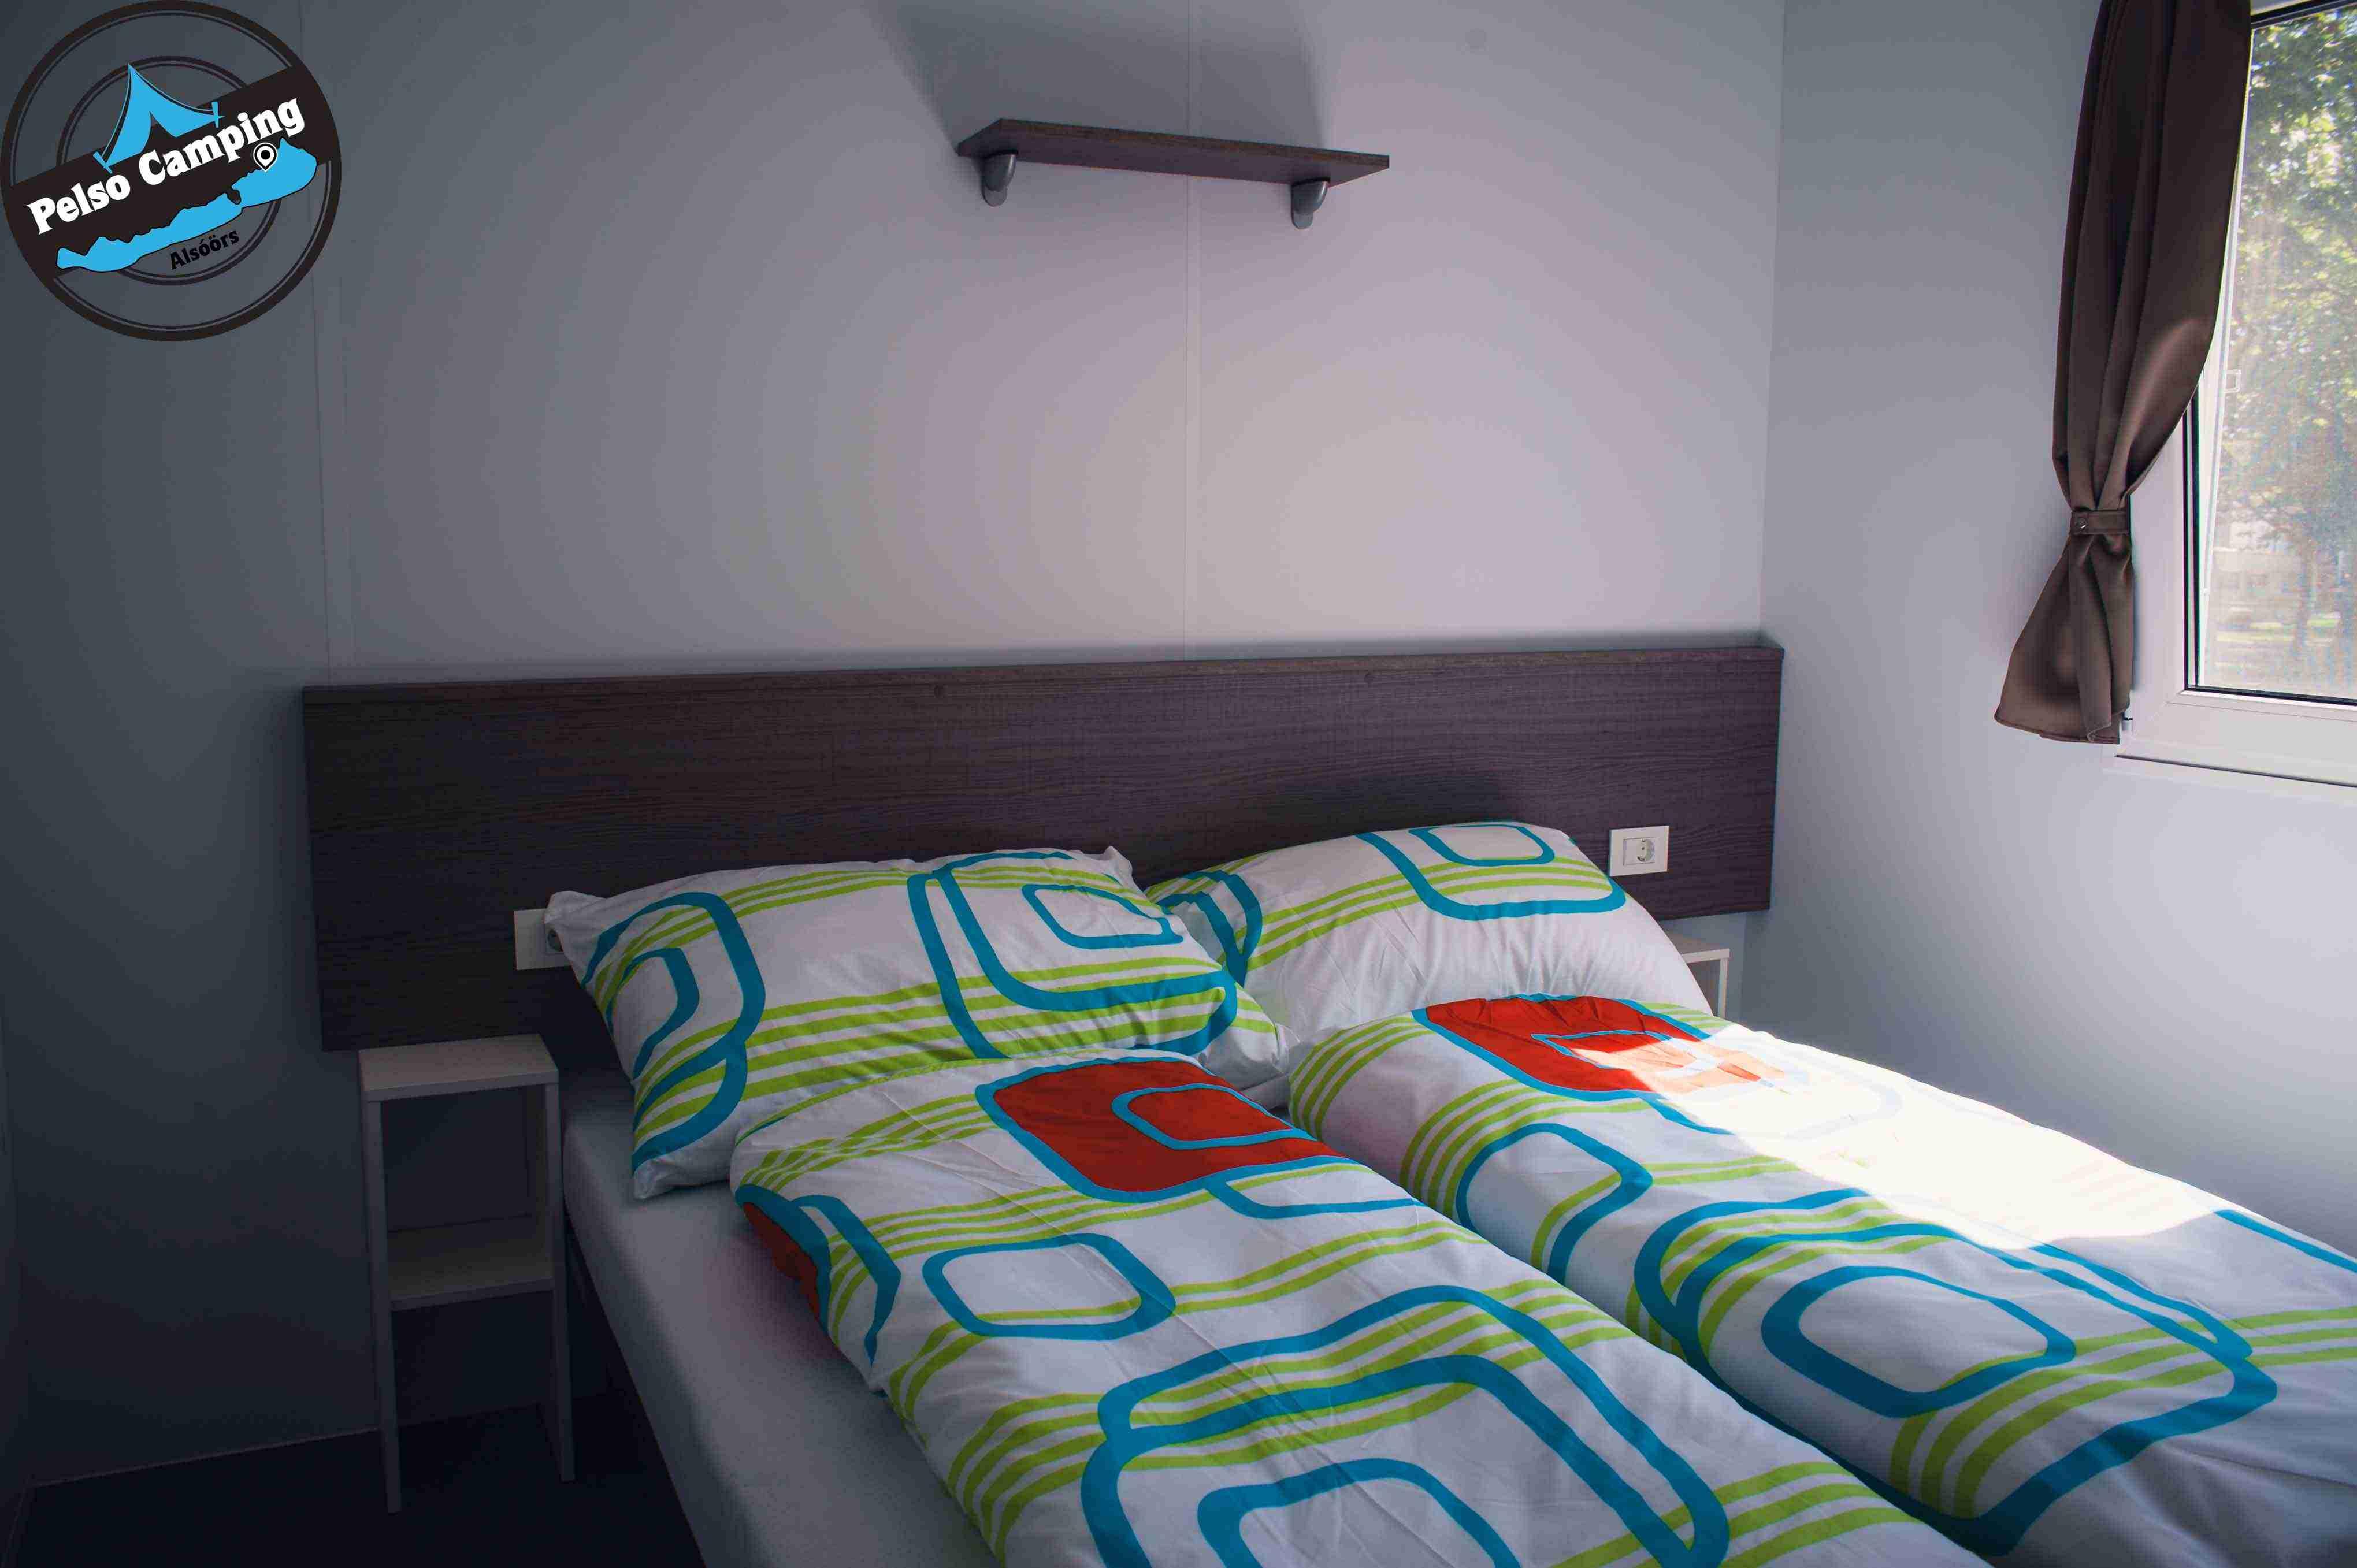 PELSO_beach_doubleroom